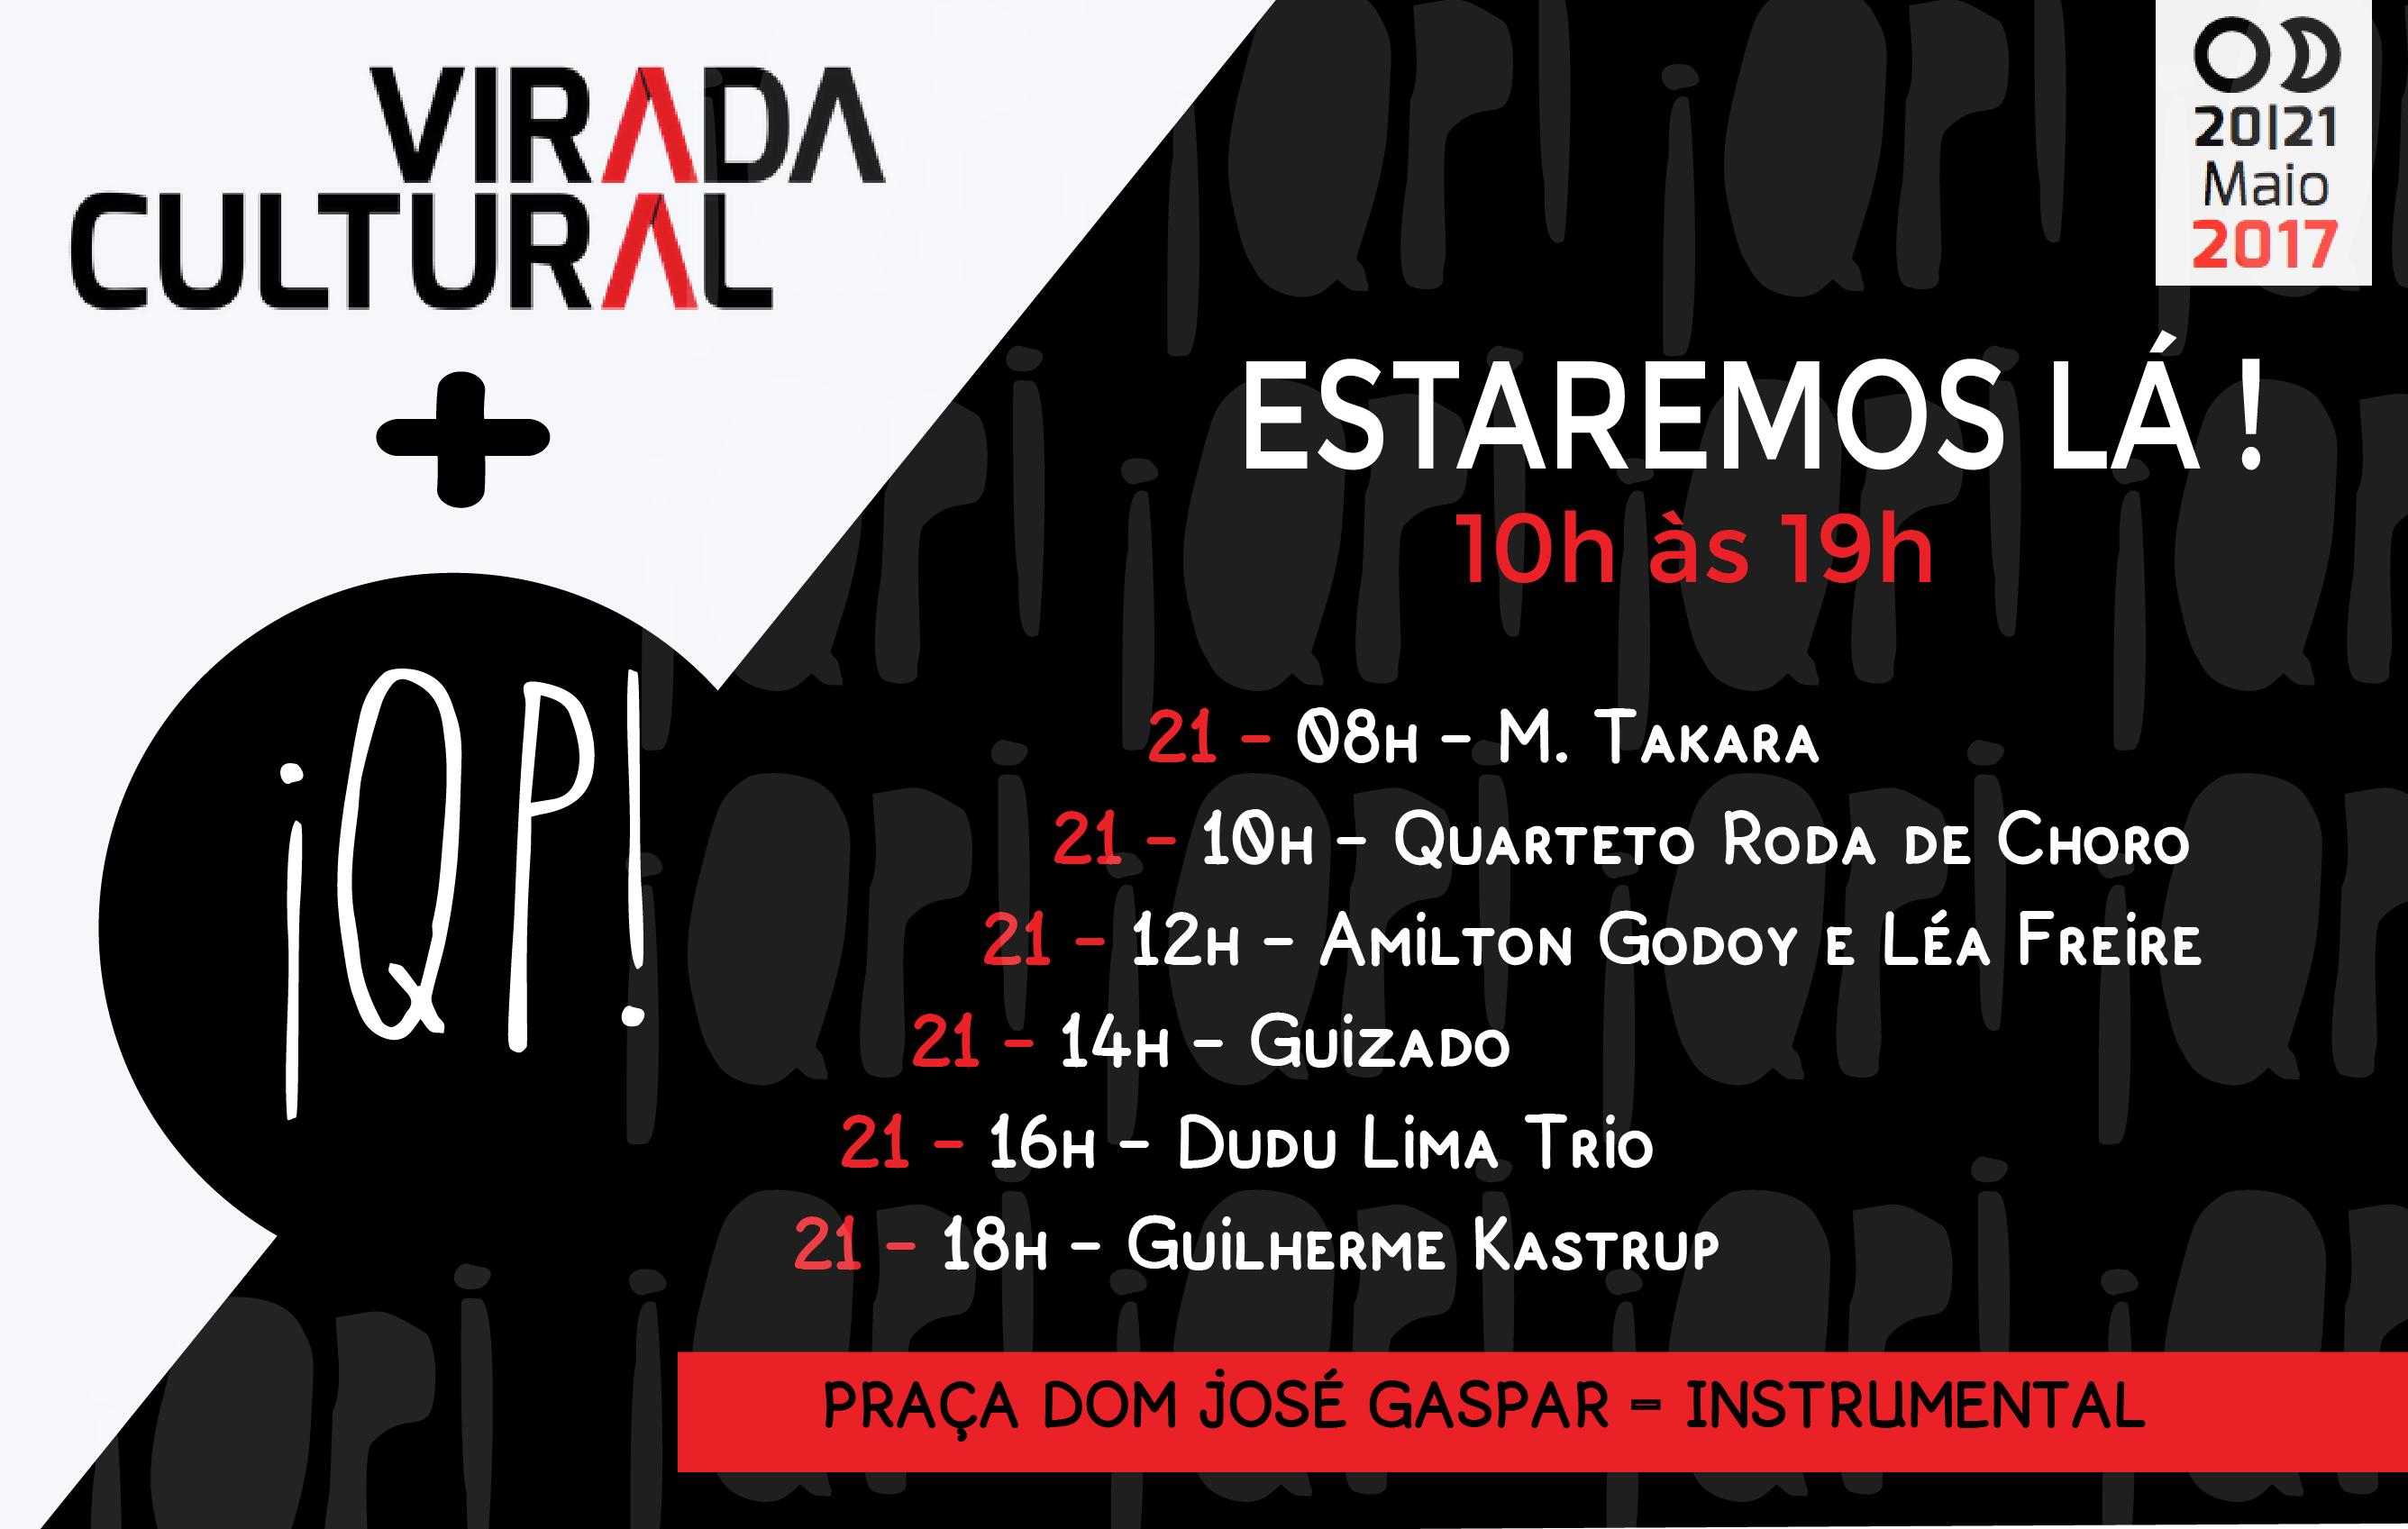 #viradaculturalsp #viradacultural